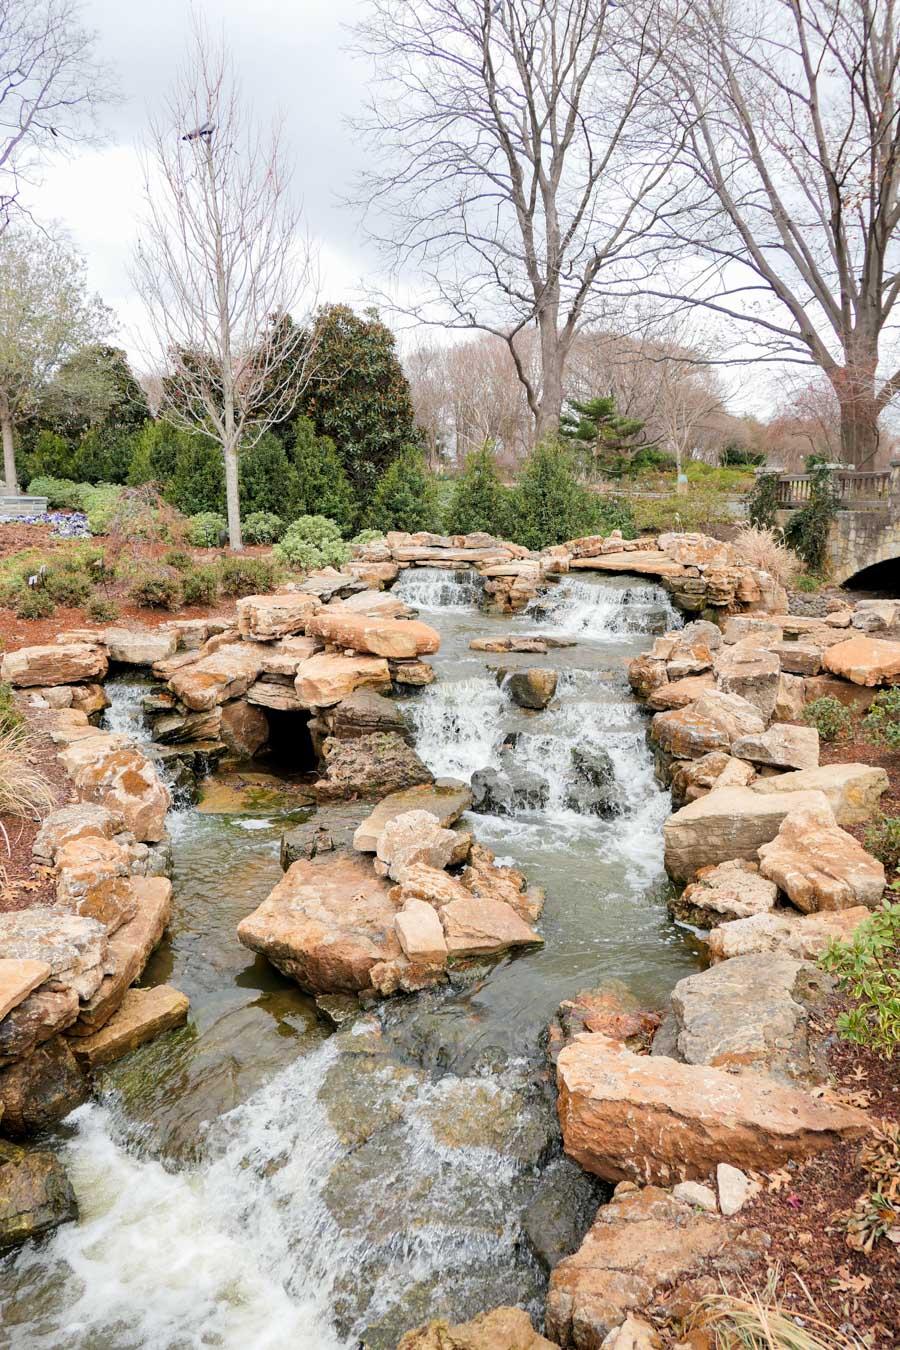 Dallas Arboretum + Botanical Gardens Photos + Review - Waterfall Fountain